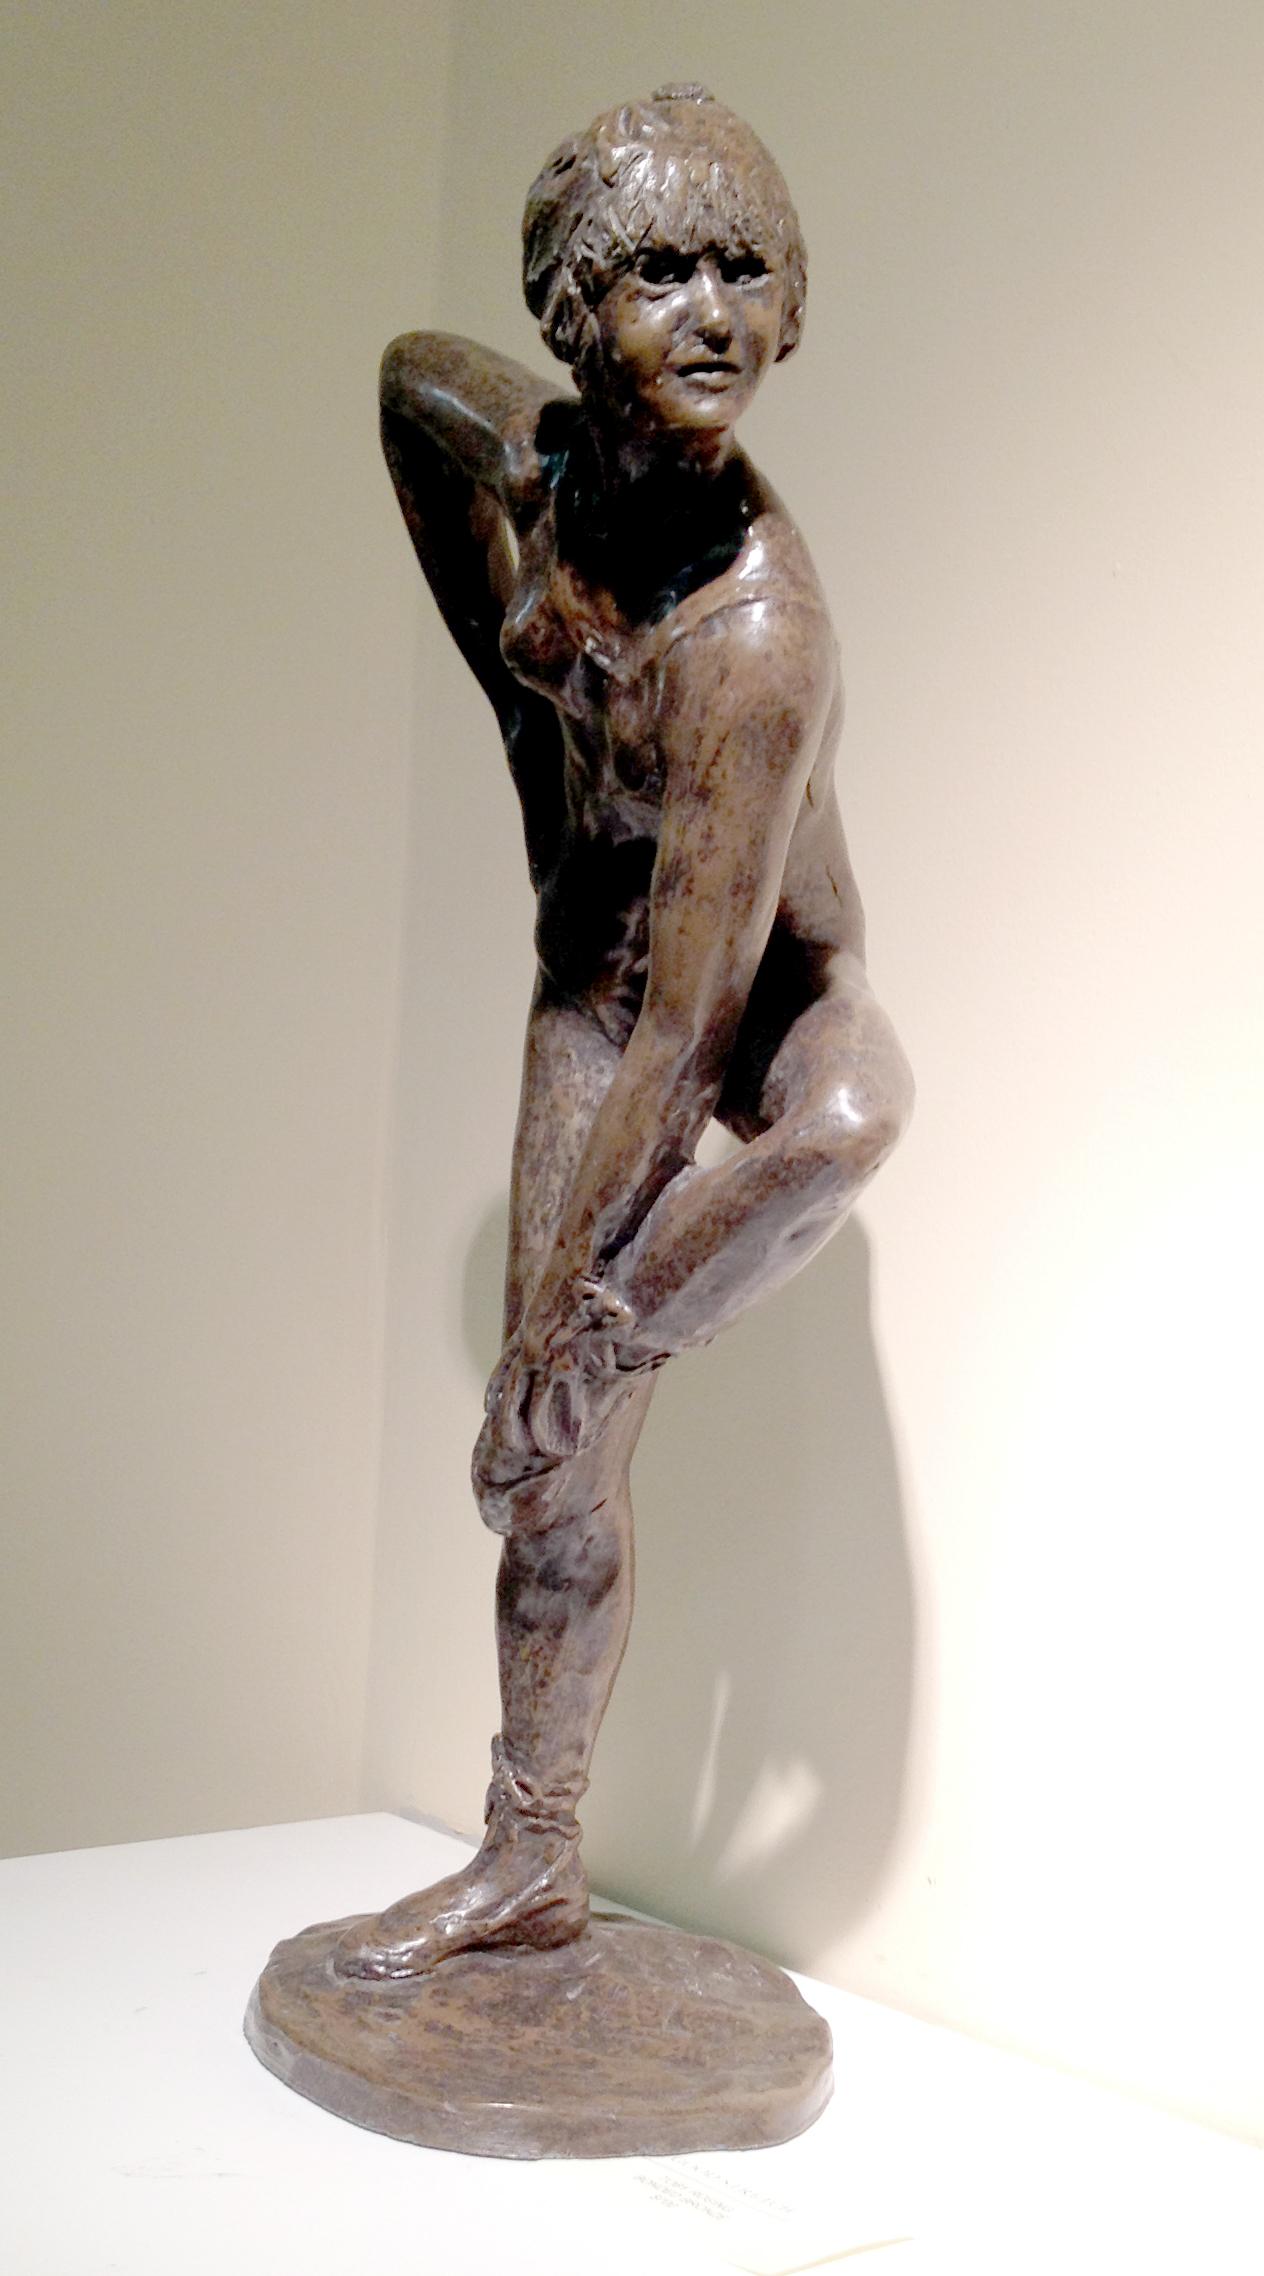 Gina's Dance - Bonded Bronze